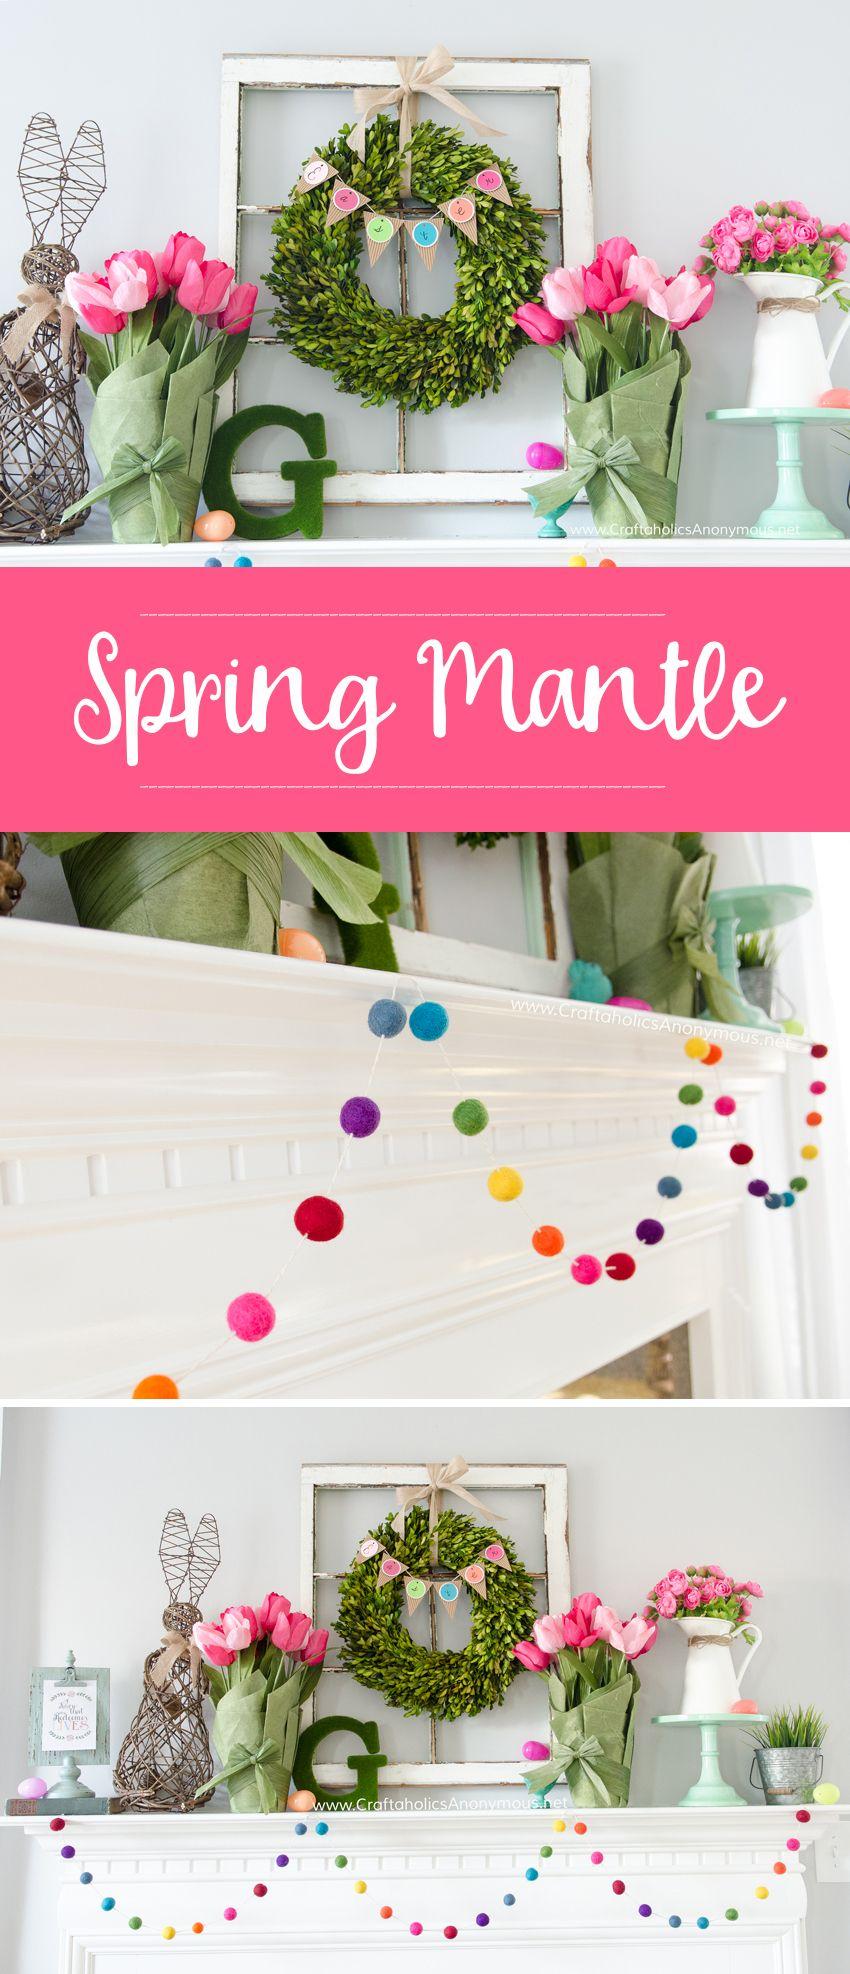 DIY Spring Mantle Decor Love That Rainbow Felt Ball Garland MichaelsMakers Craftaholics Anonymous